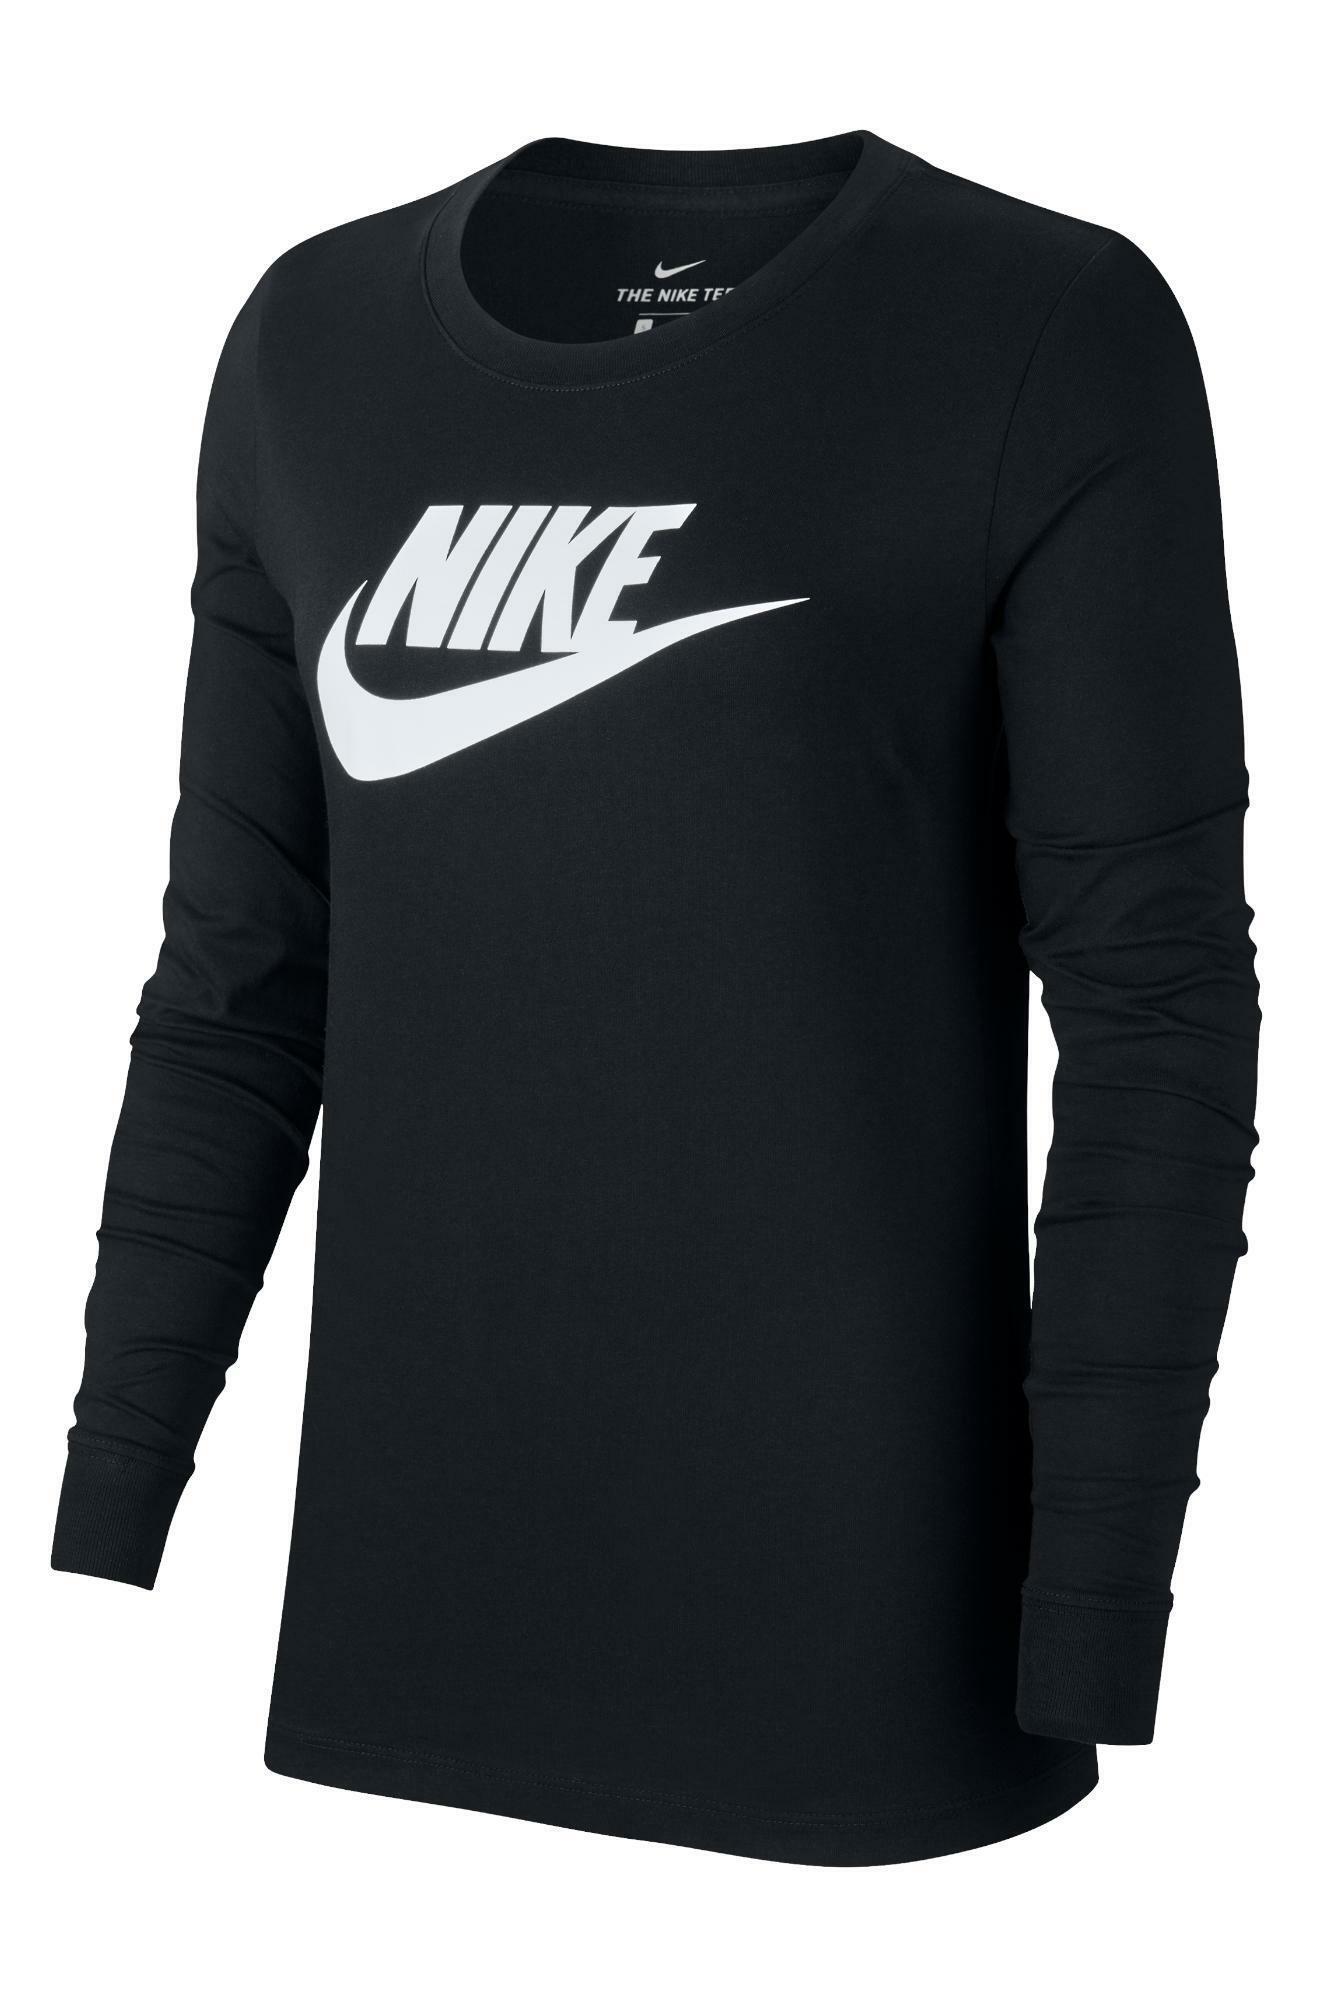 nike nike t-shirt donna bv6171 010 nero